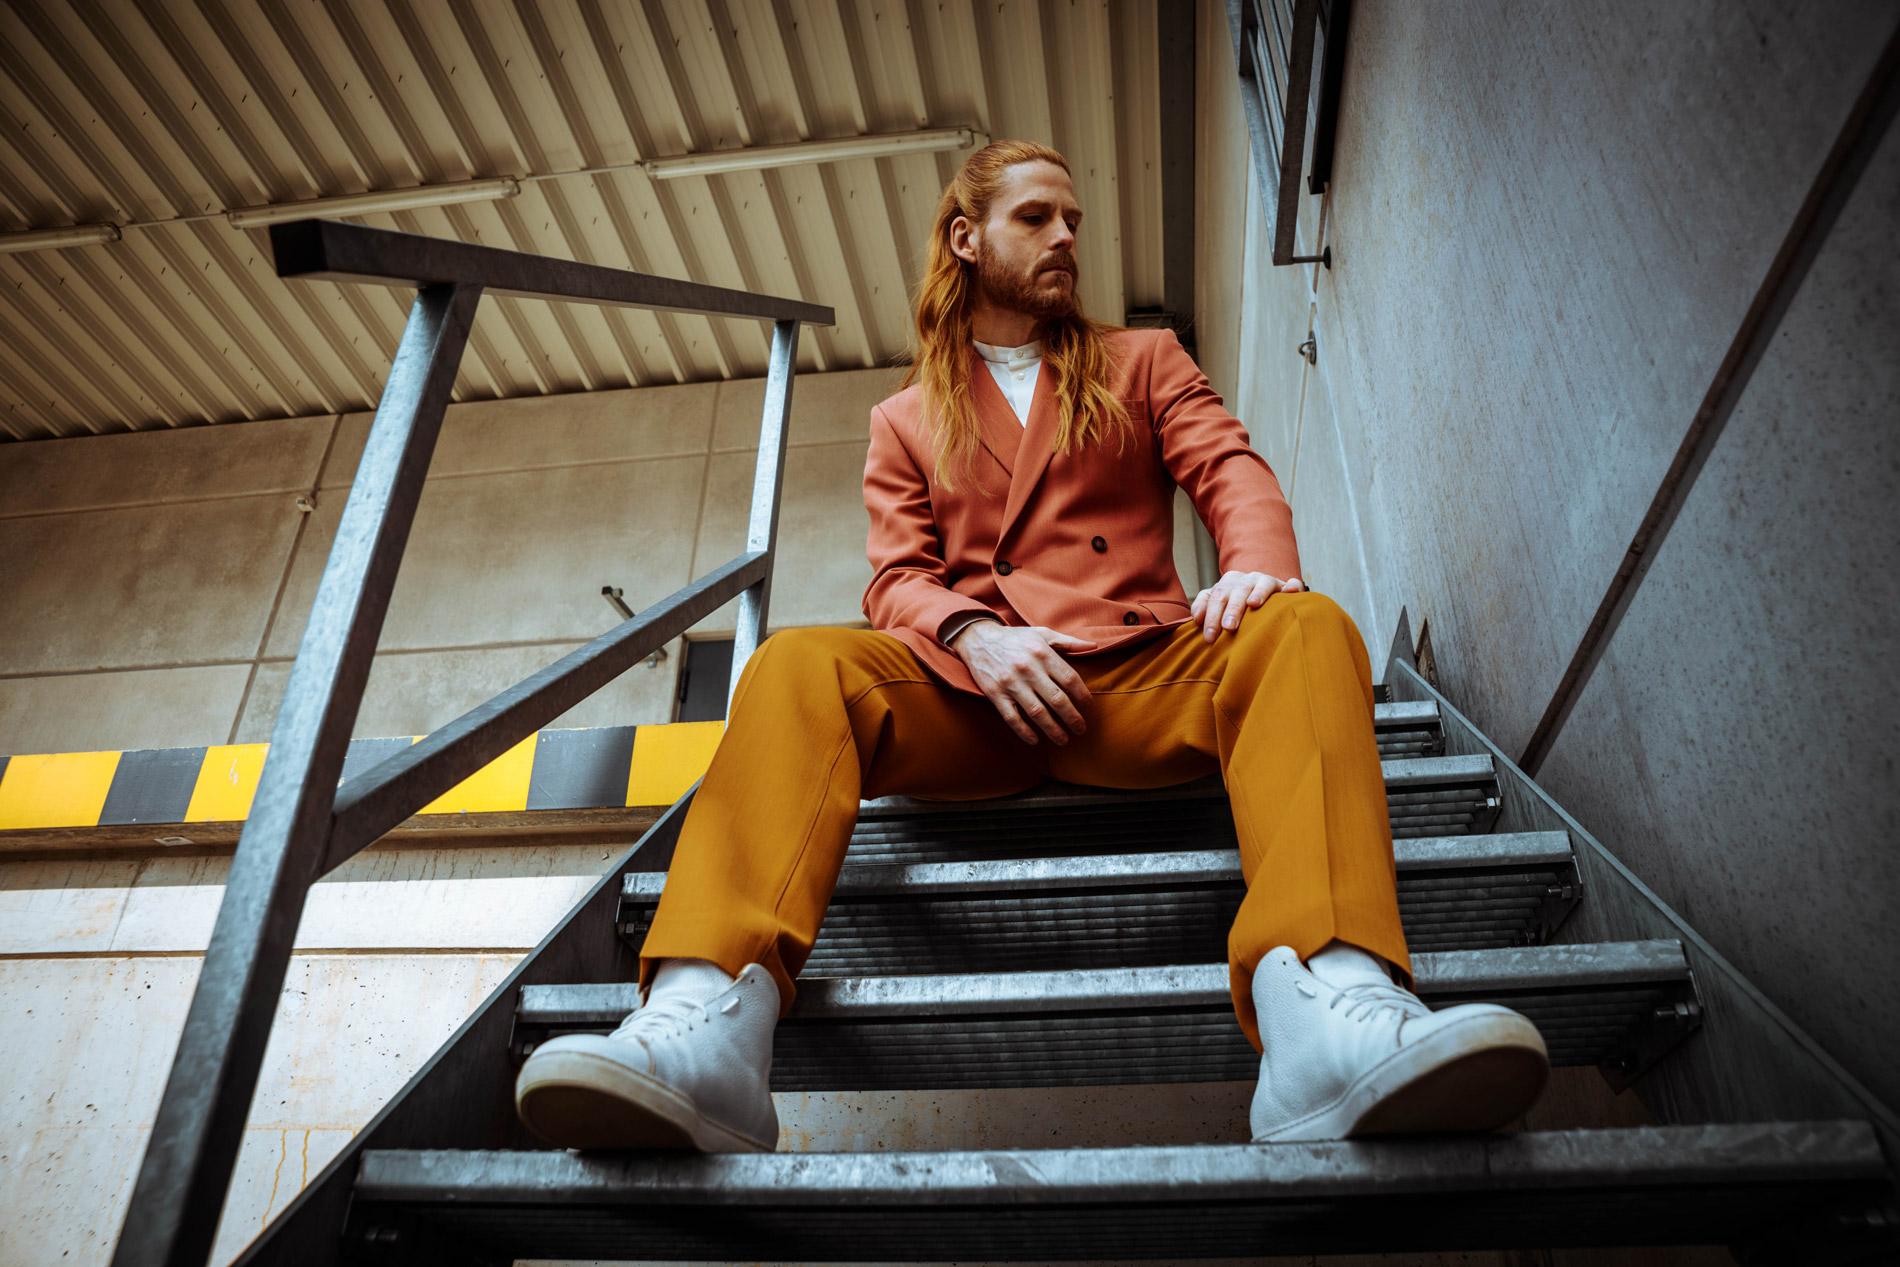 Tiger-of-Sweden-Anzug-Blazer-Fruehlingsfarben-Outfit-Style-elegant